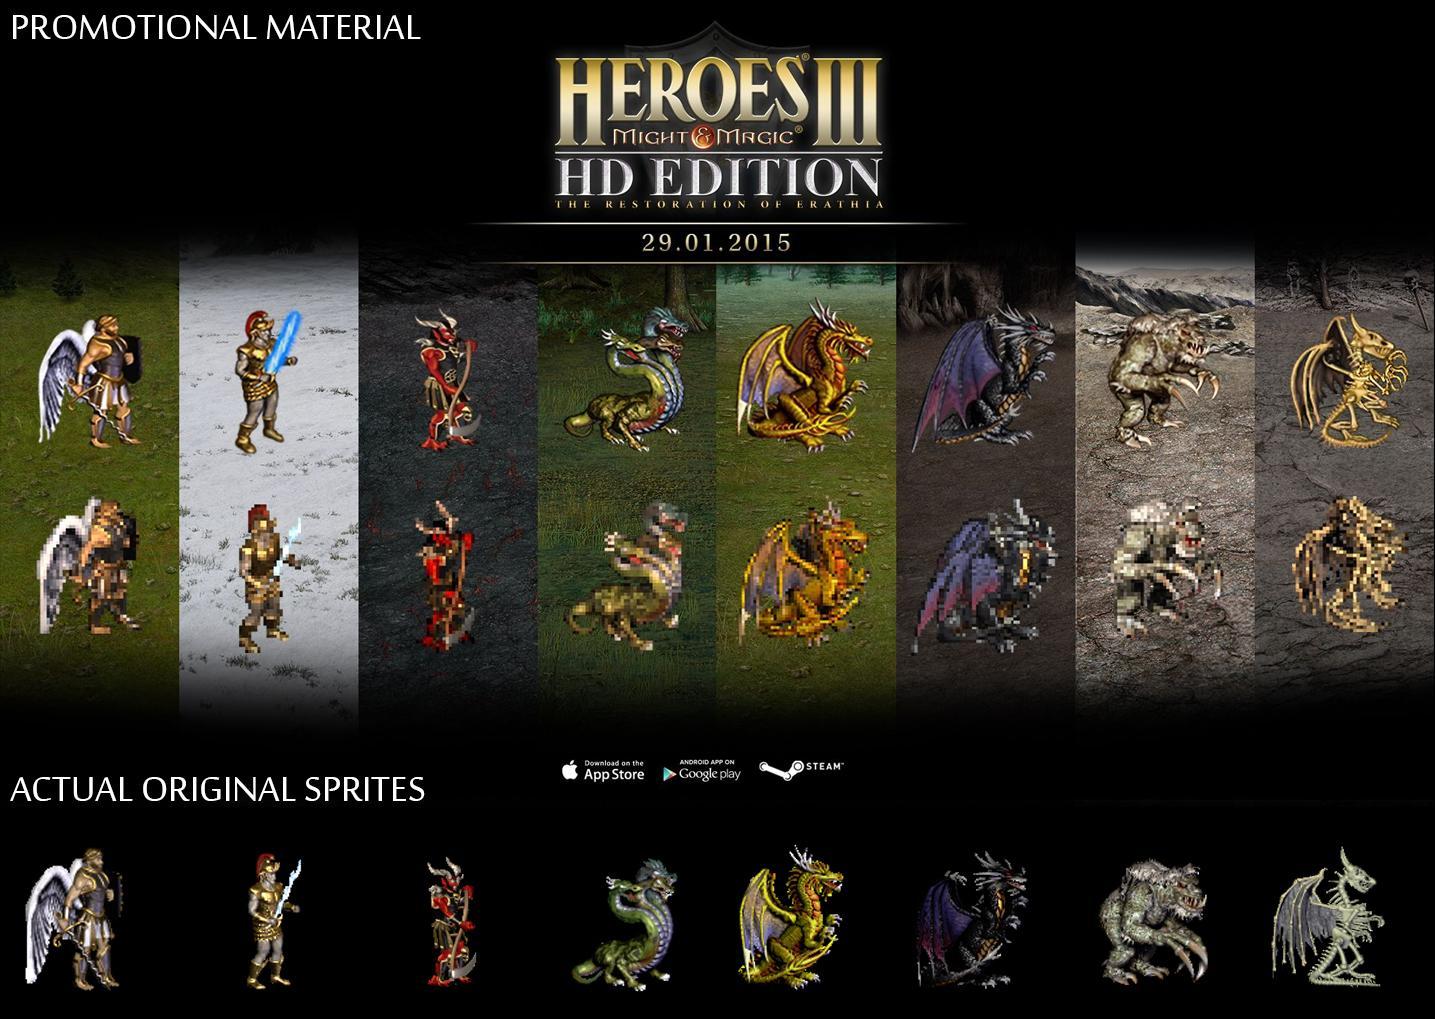 HoM&M III HD lying about original HoM&M III sprites